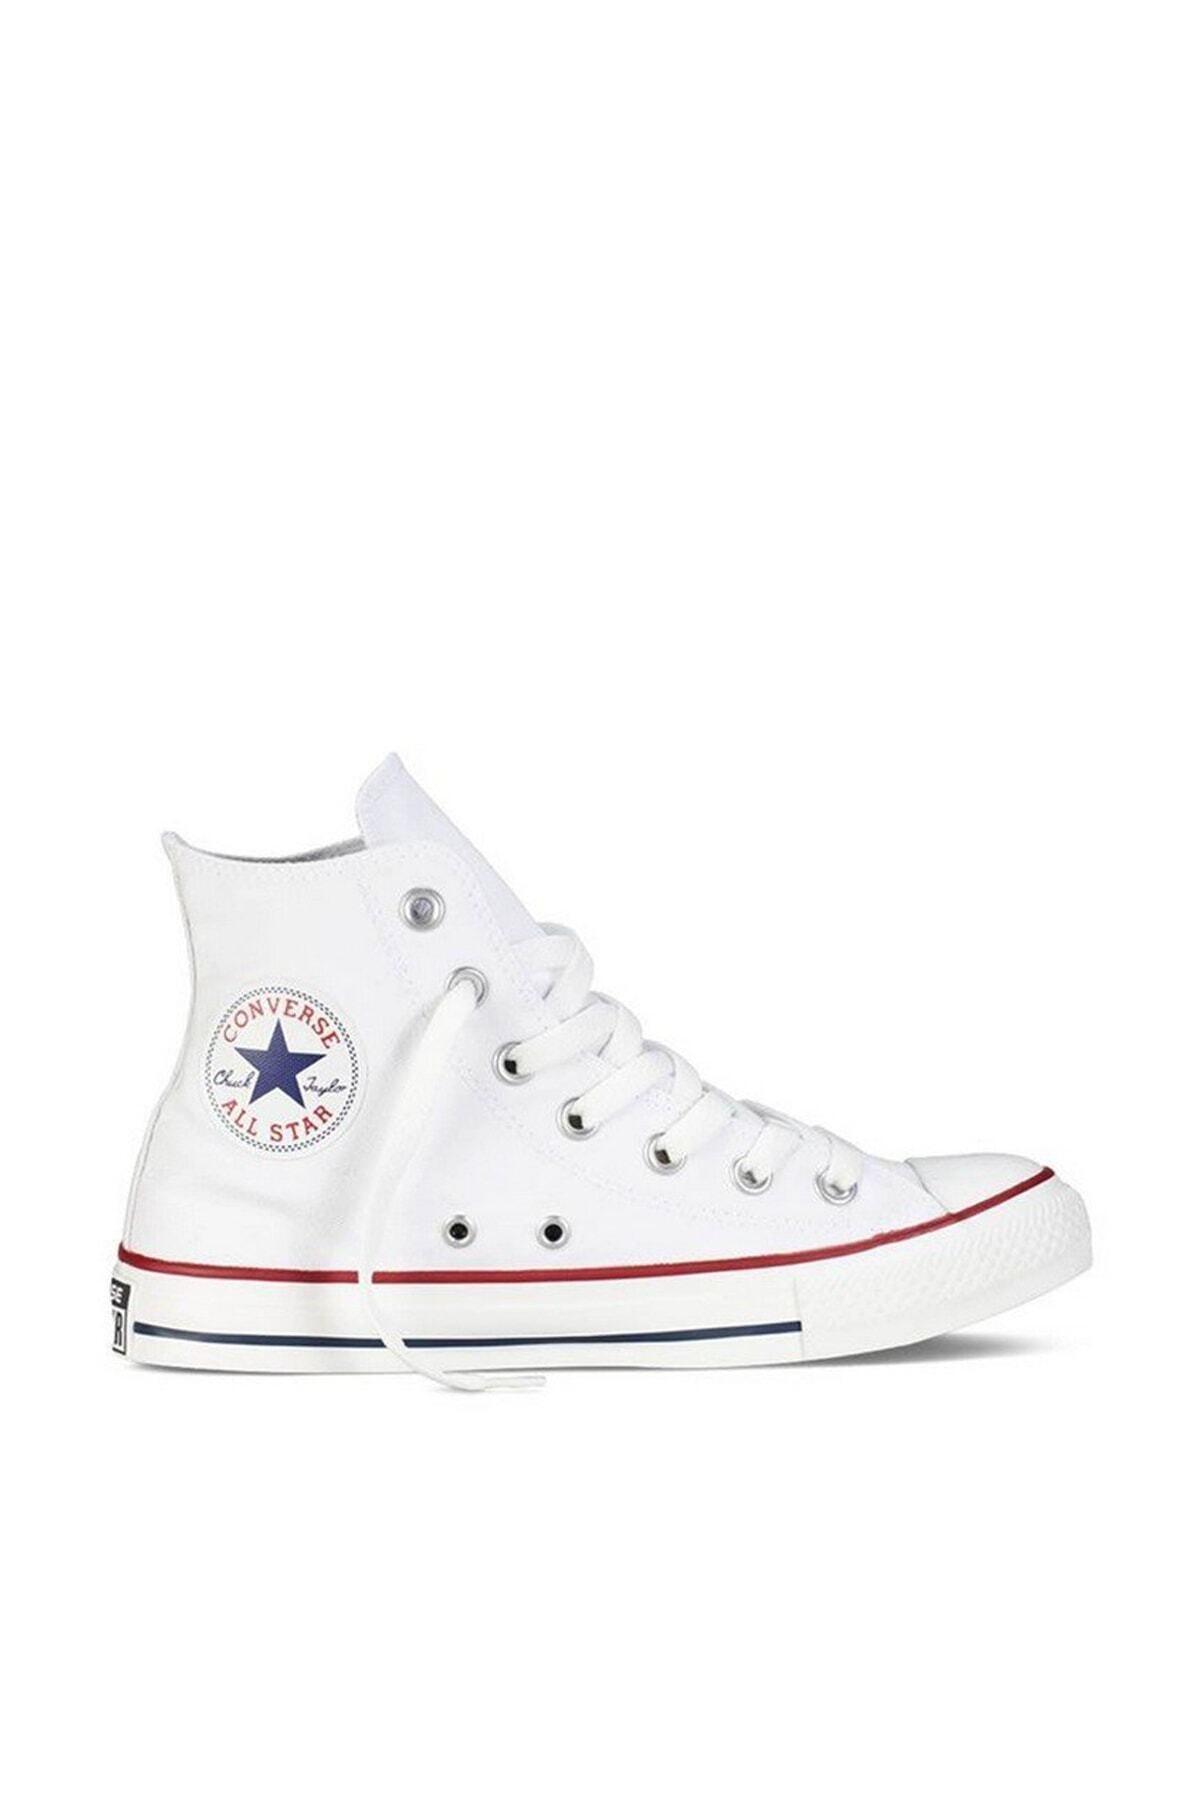 converse Unisex Beyaz Sneaker Chuck Taylor Allstar - M7650c M7650c 1